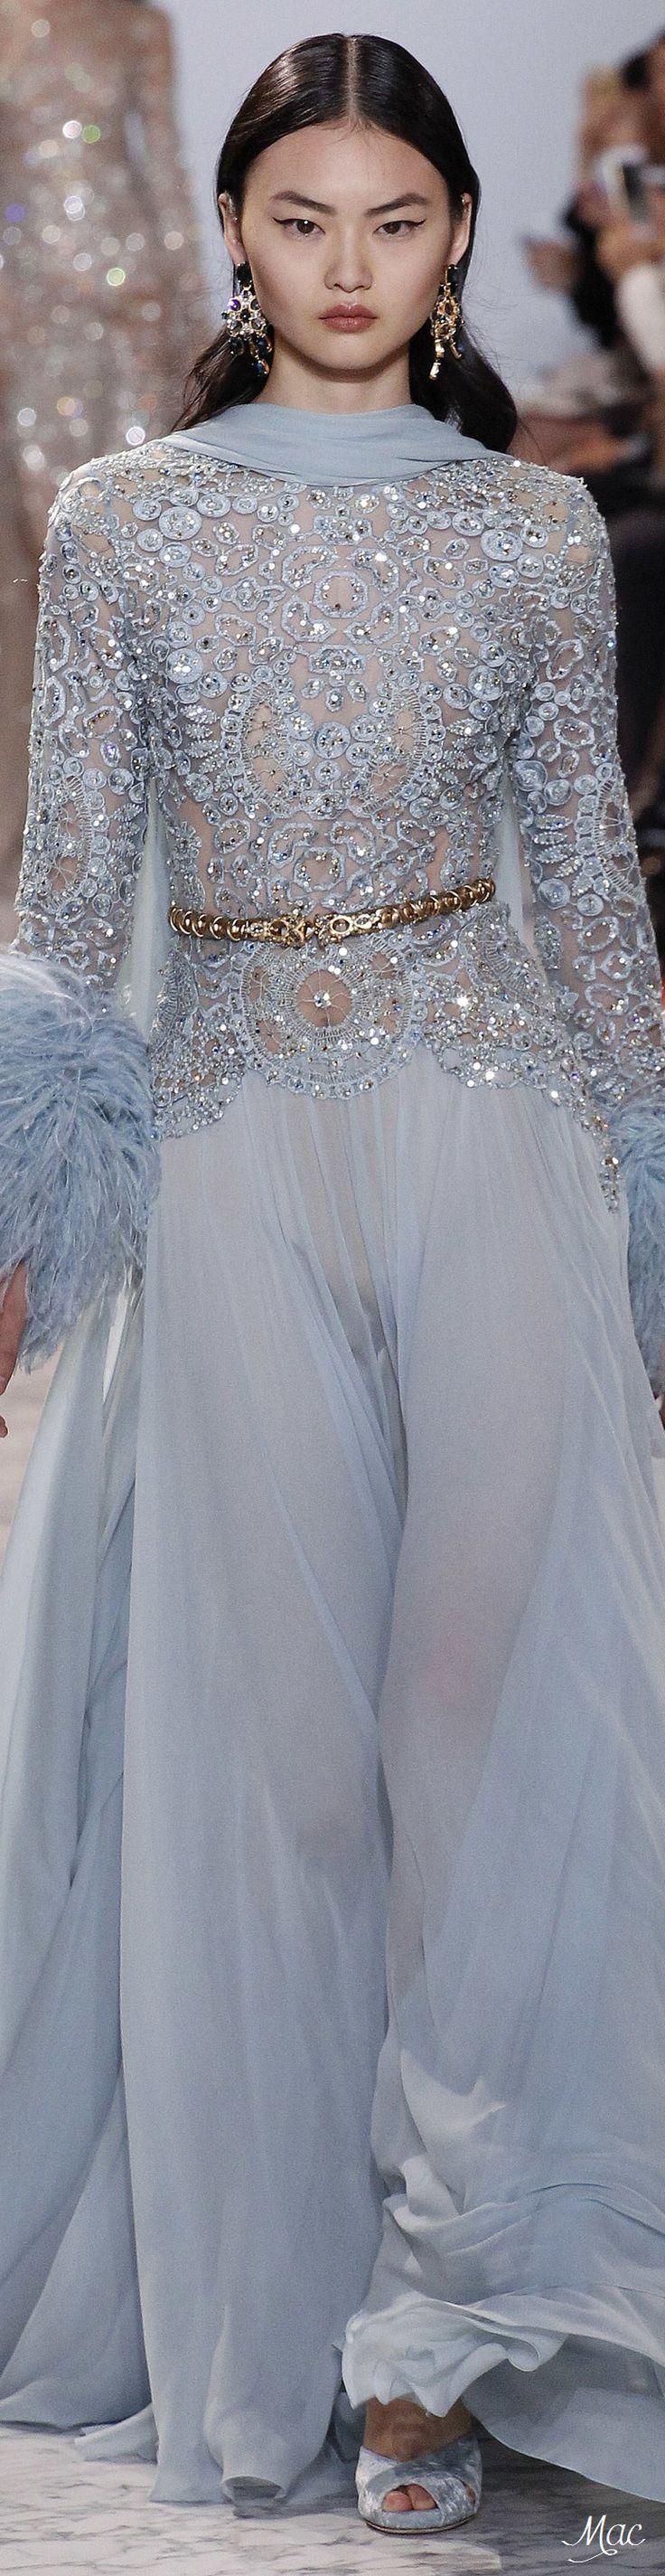 Spring 2017 Haute Couture Elie Saab